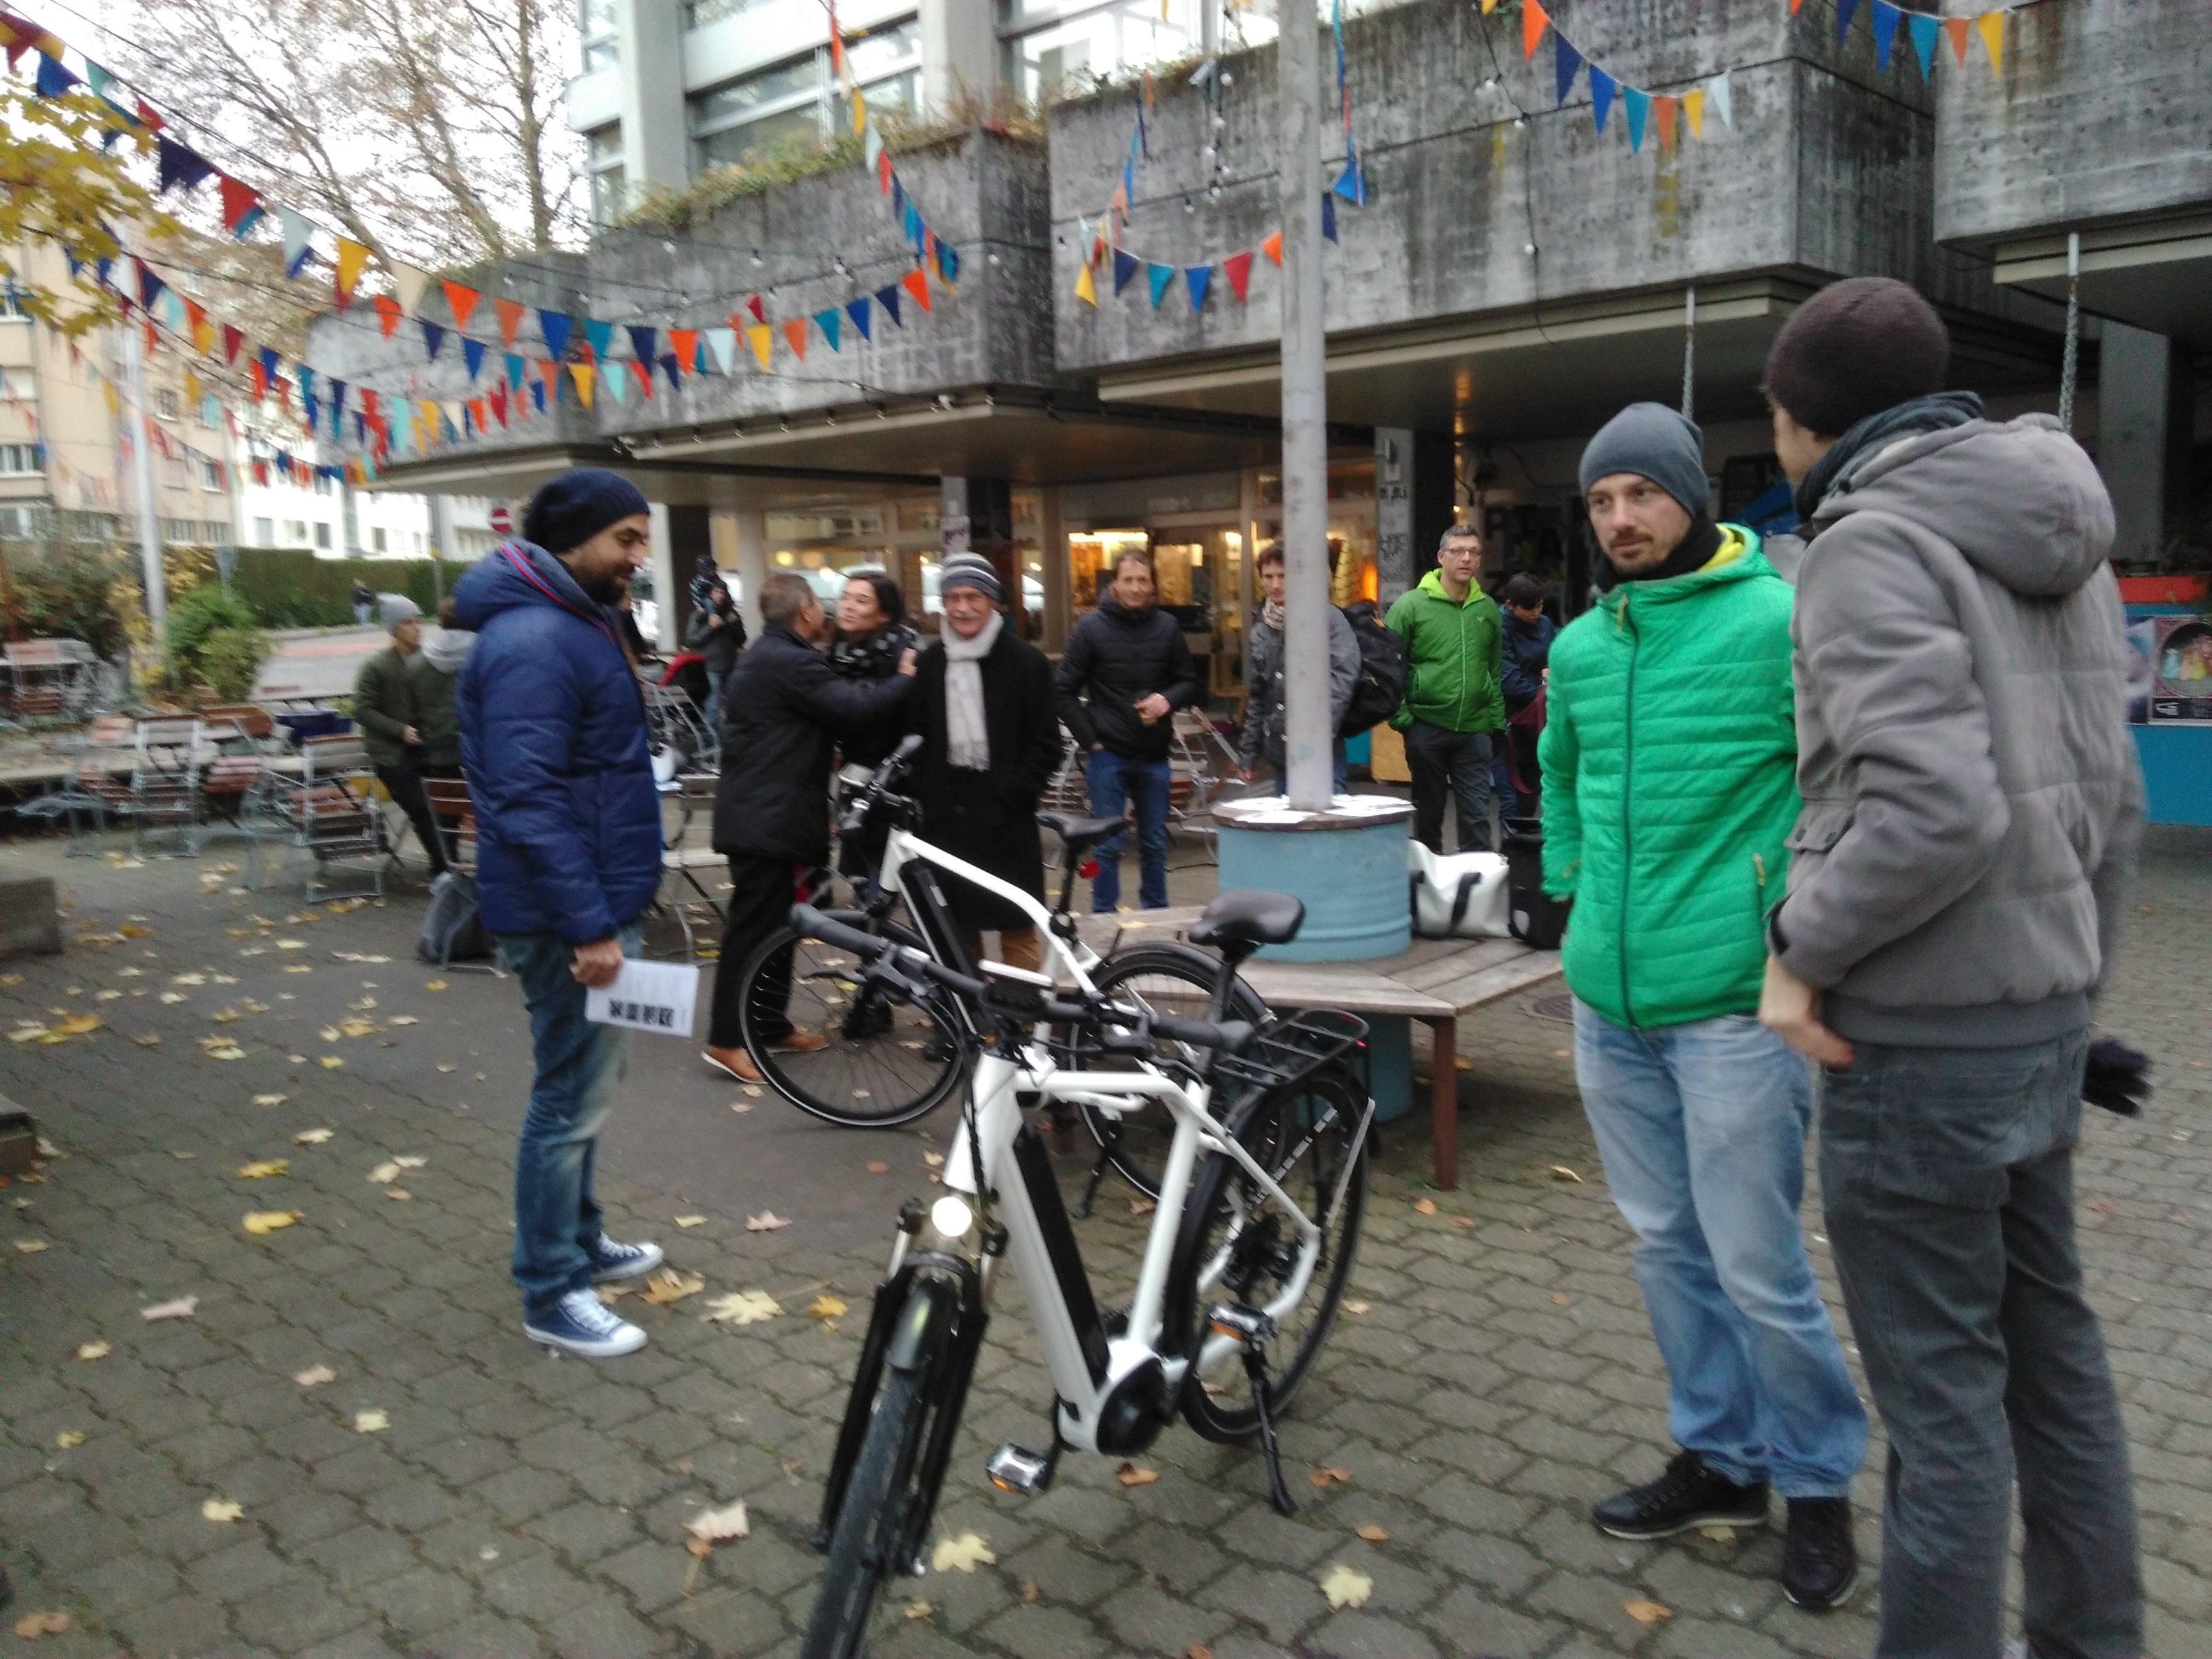 Start_Crowdfuning_Neubad_18.11.17_2_low.jpg